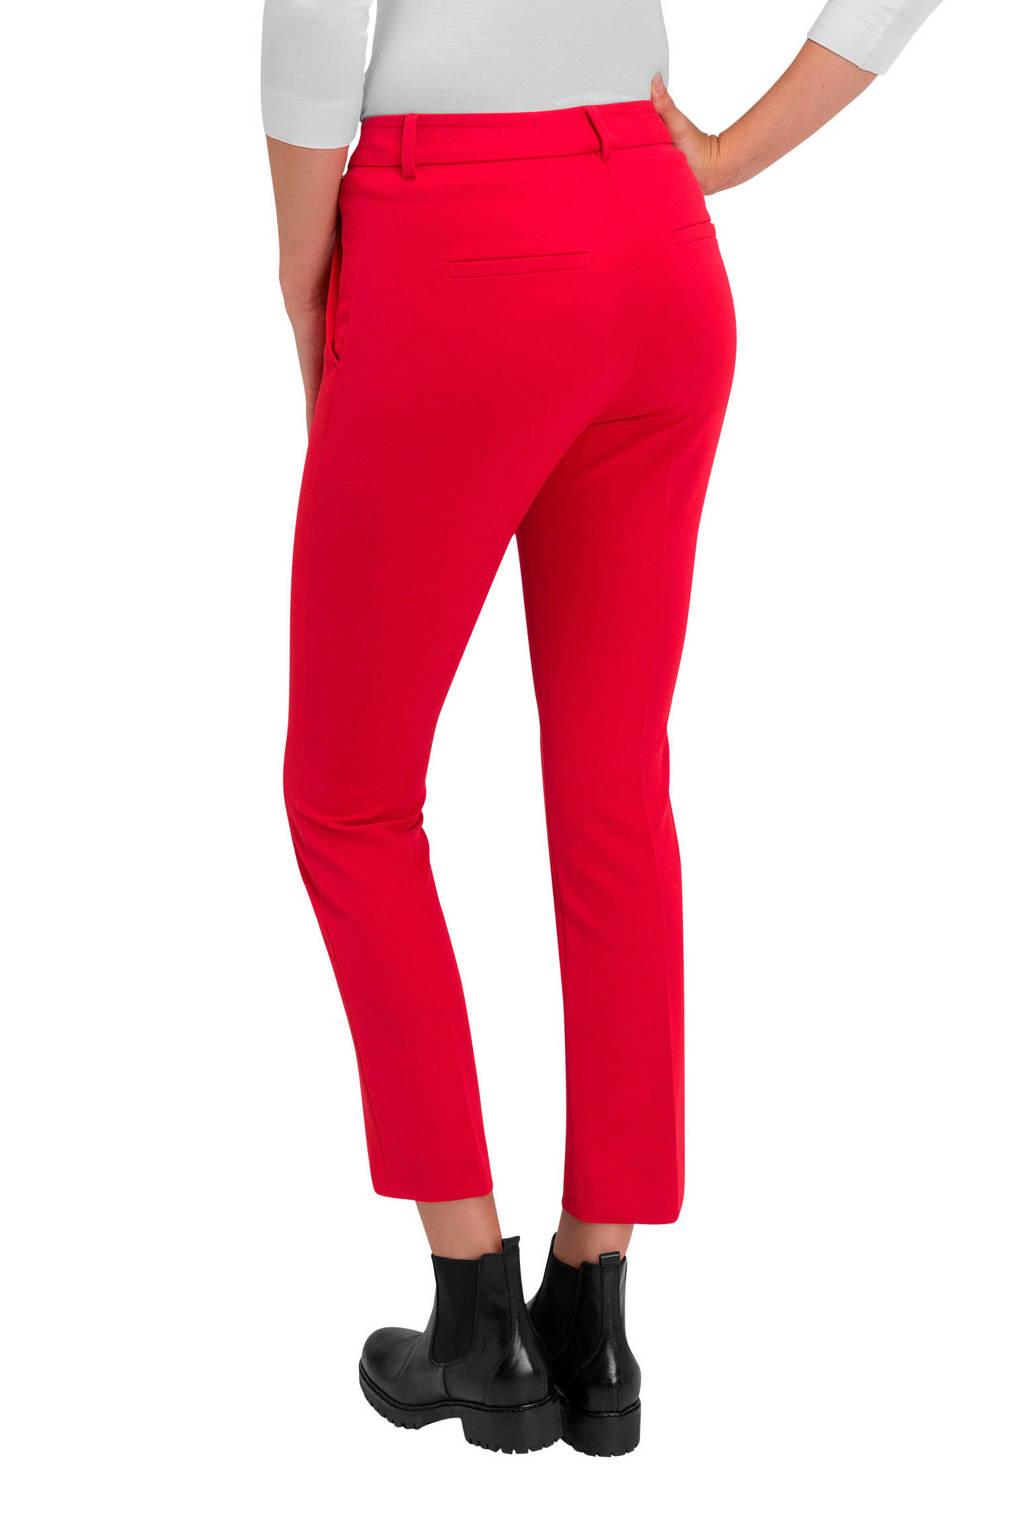 Claudia Sträter straight fit pantalon rood, Rood